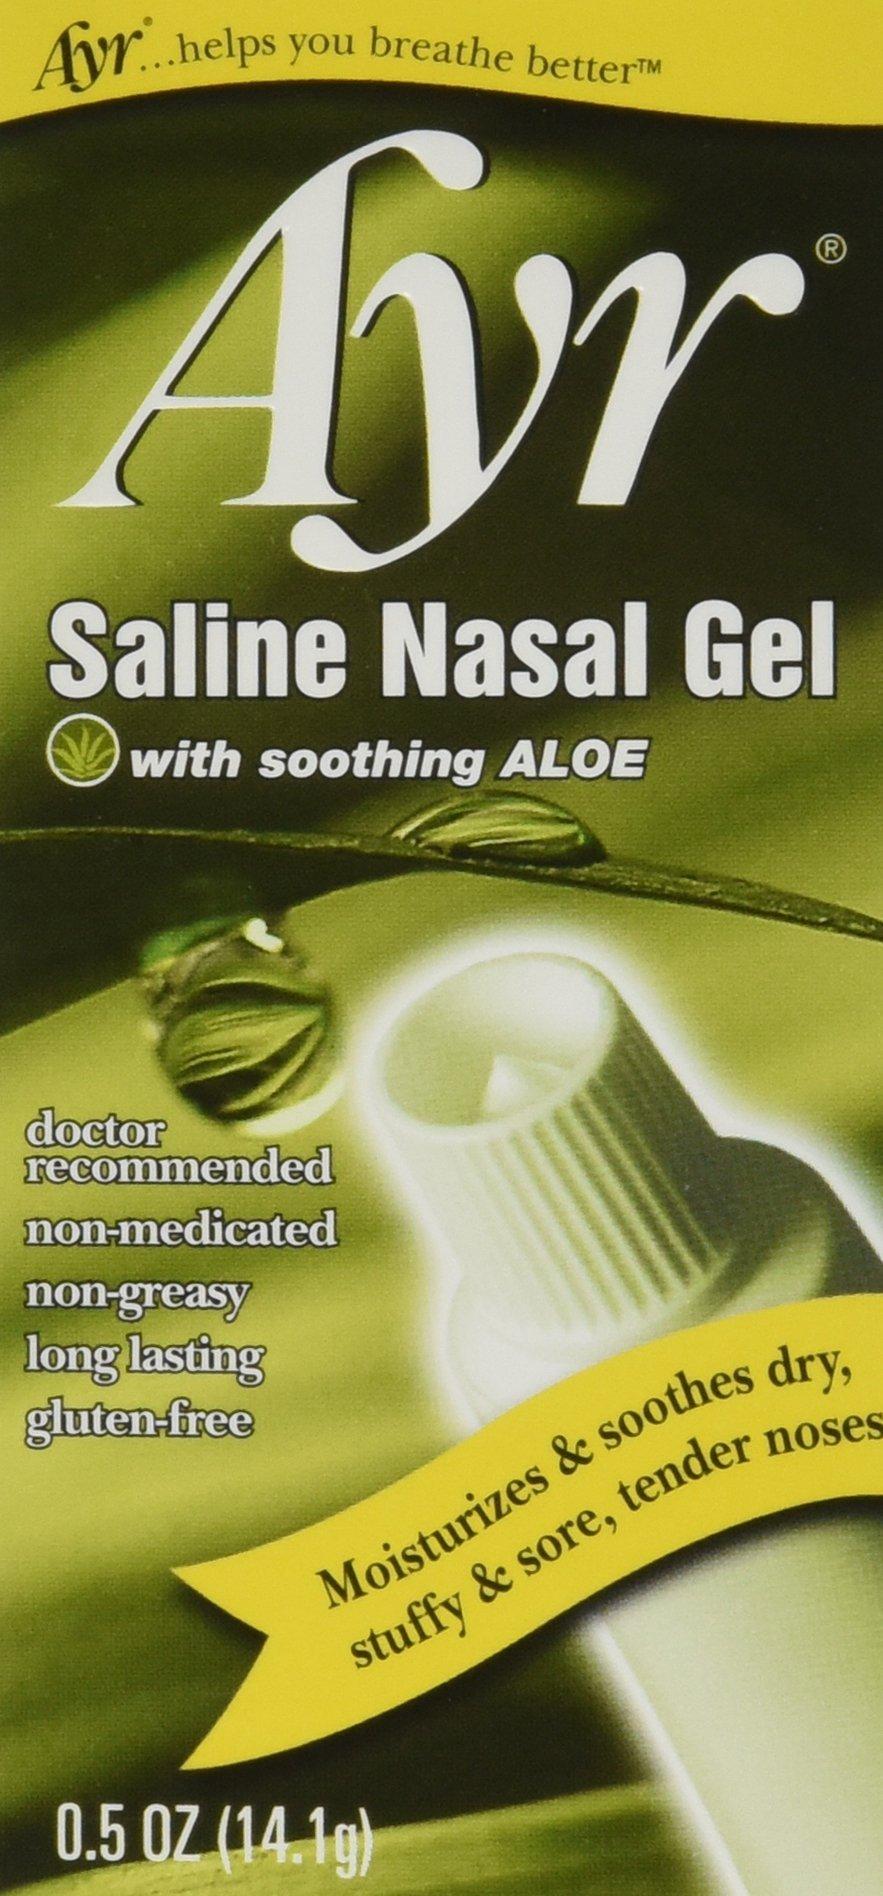 Ayr Saline Nasal Gel, With Soothing Aloe, 0.5 Ounce Tube (Pack of 3)